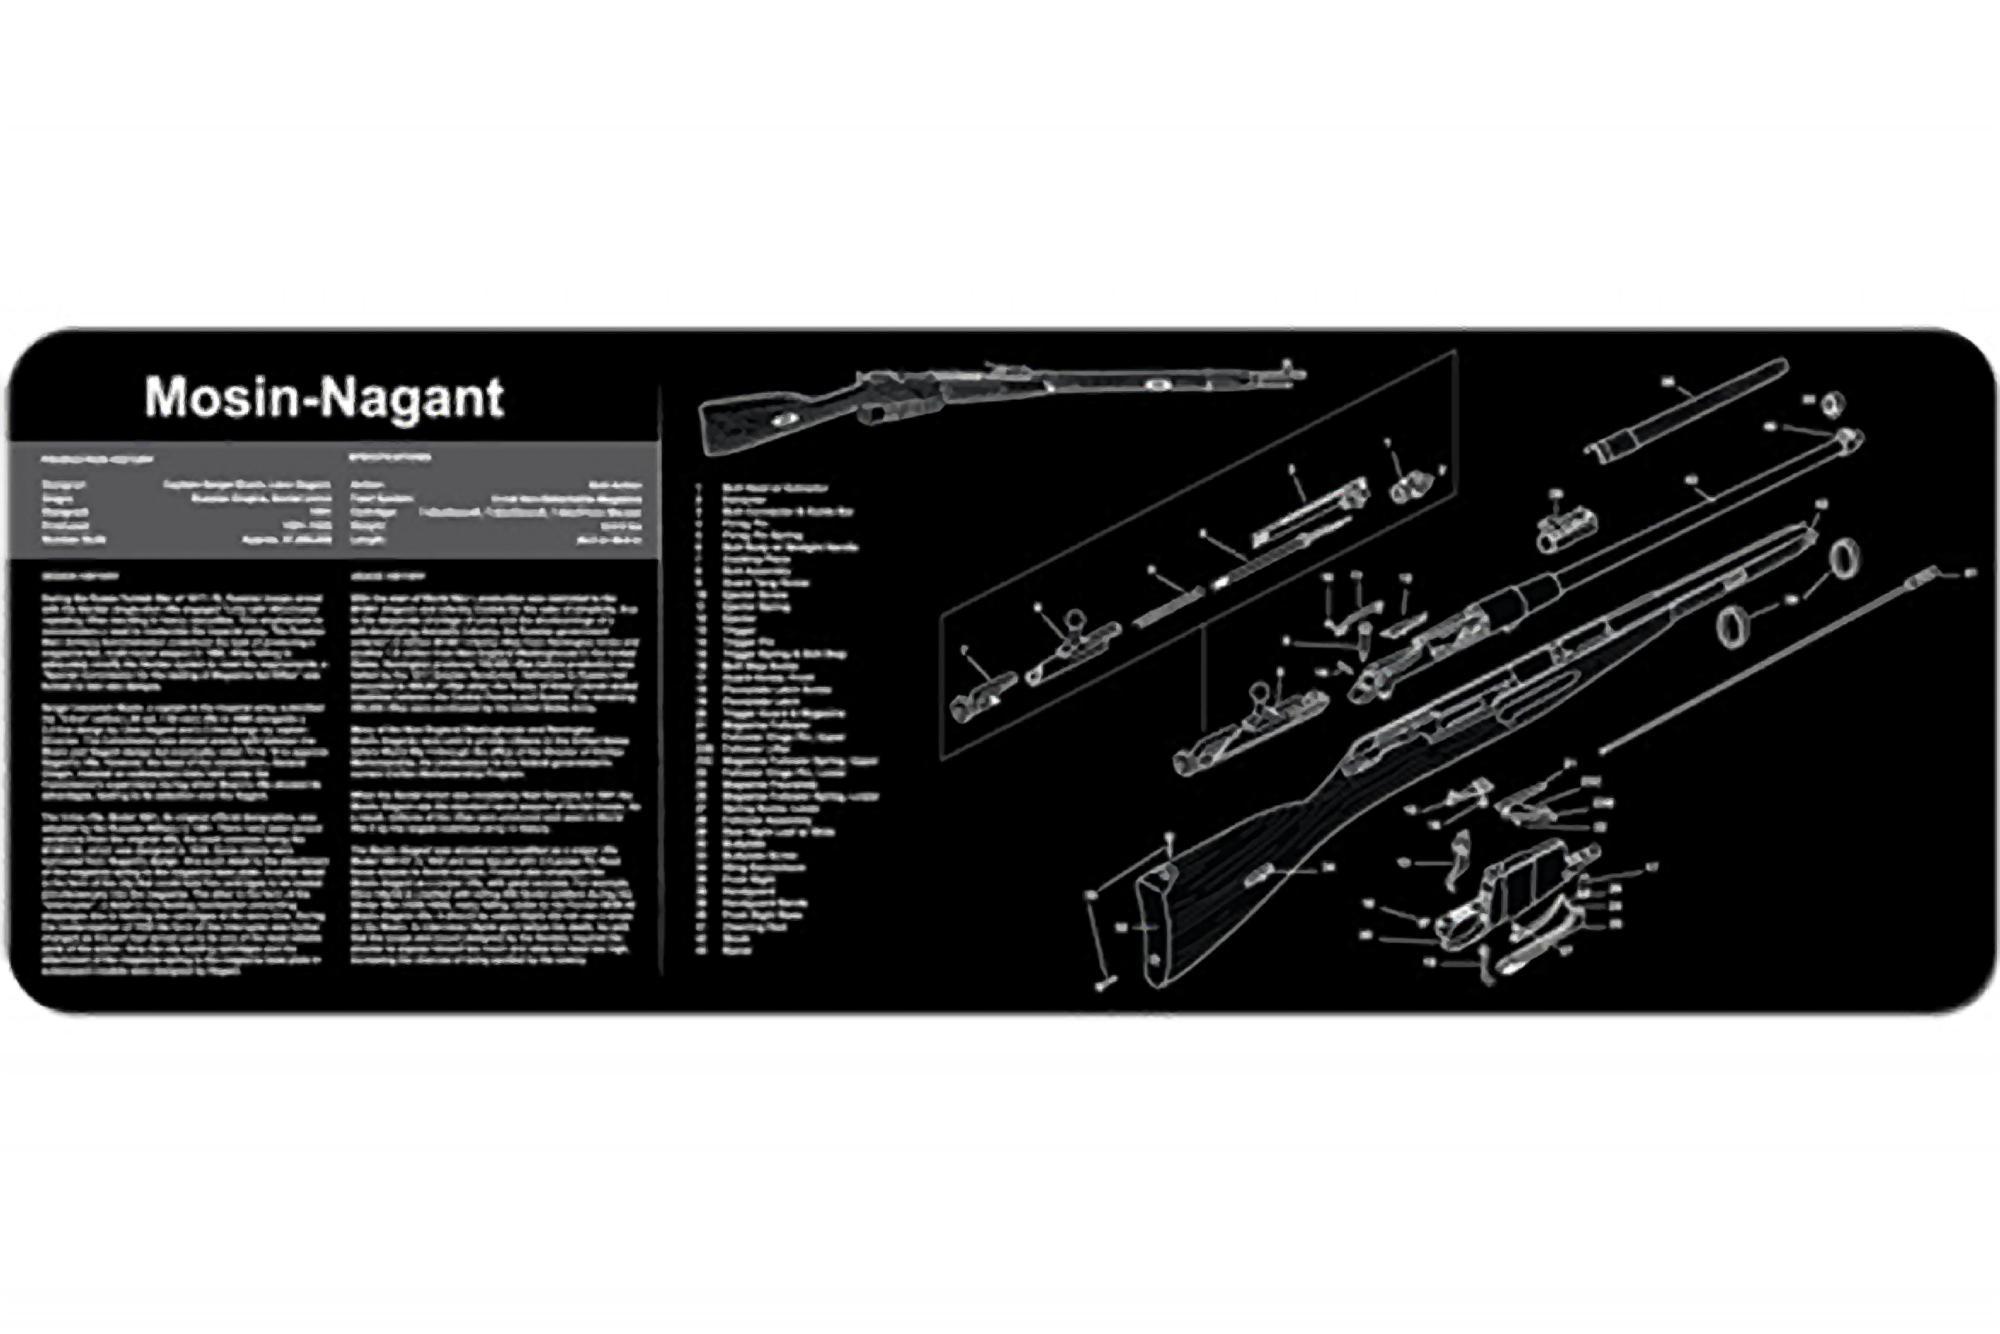 Tekmat Mosin Nagant Gun Cleaning Mat 36 Parts Diagram